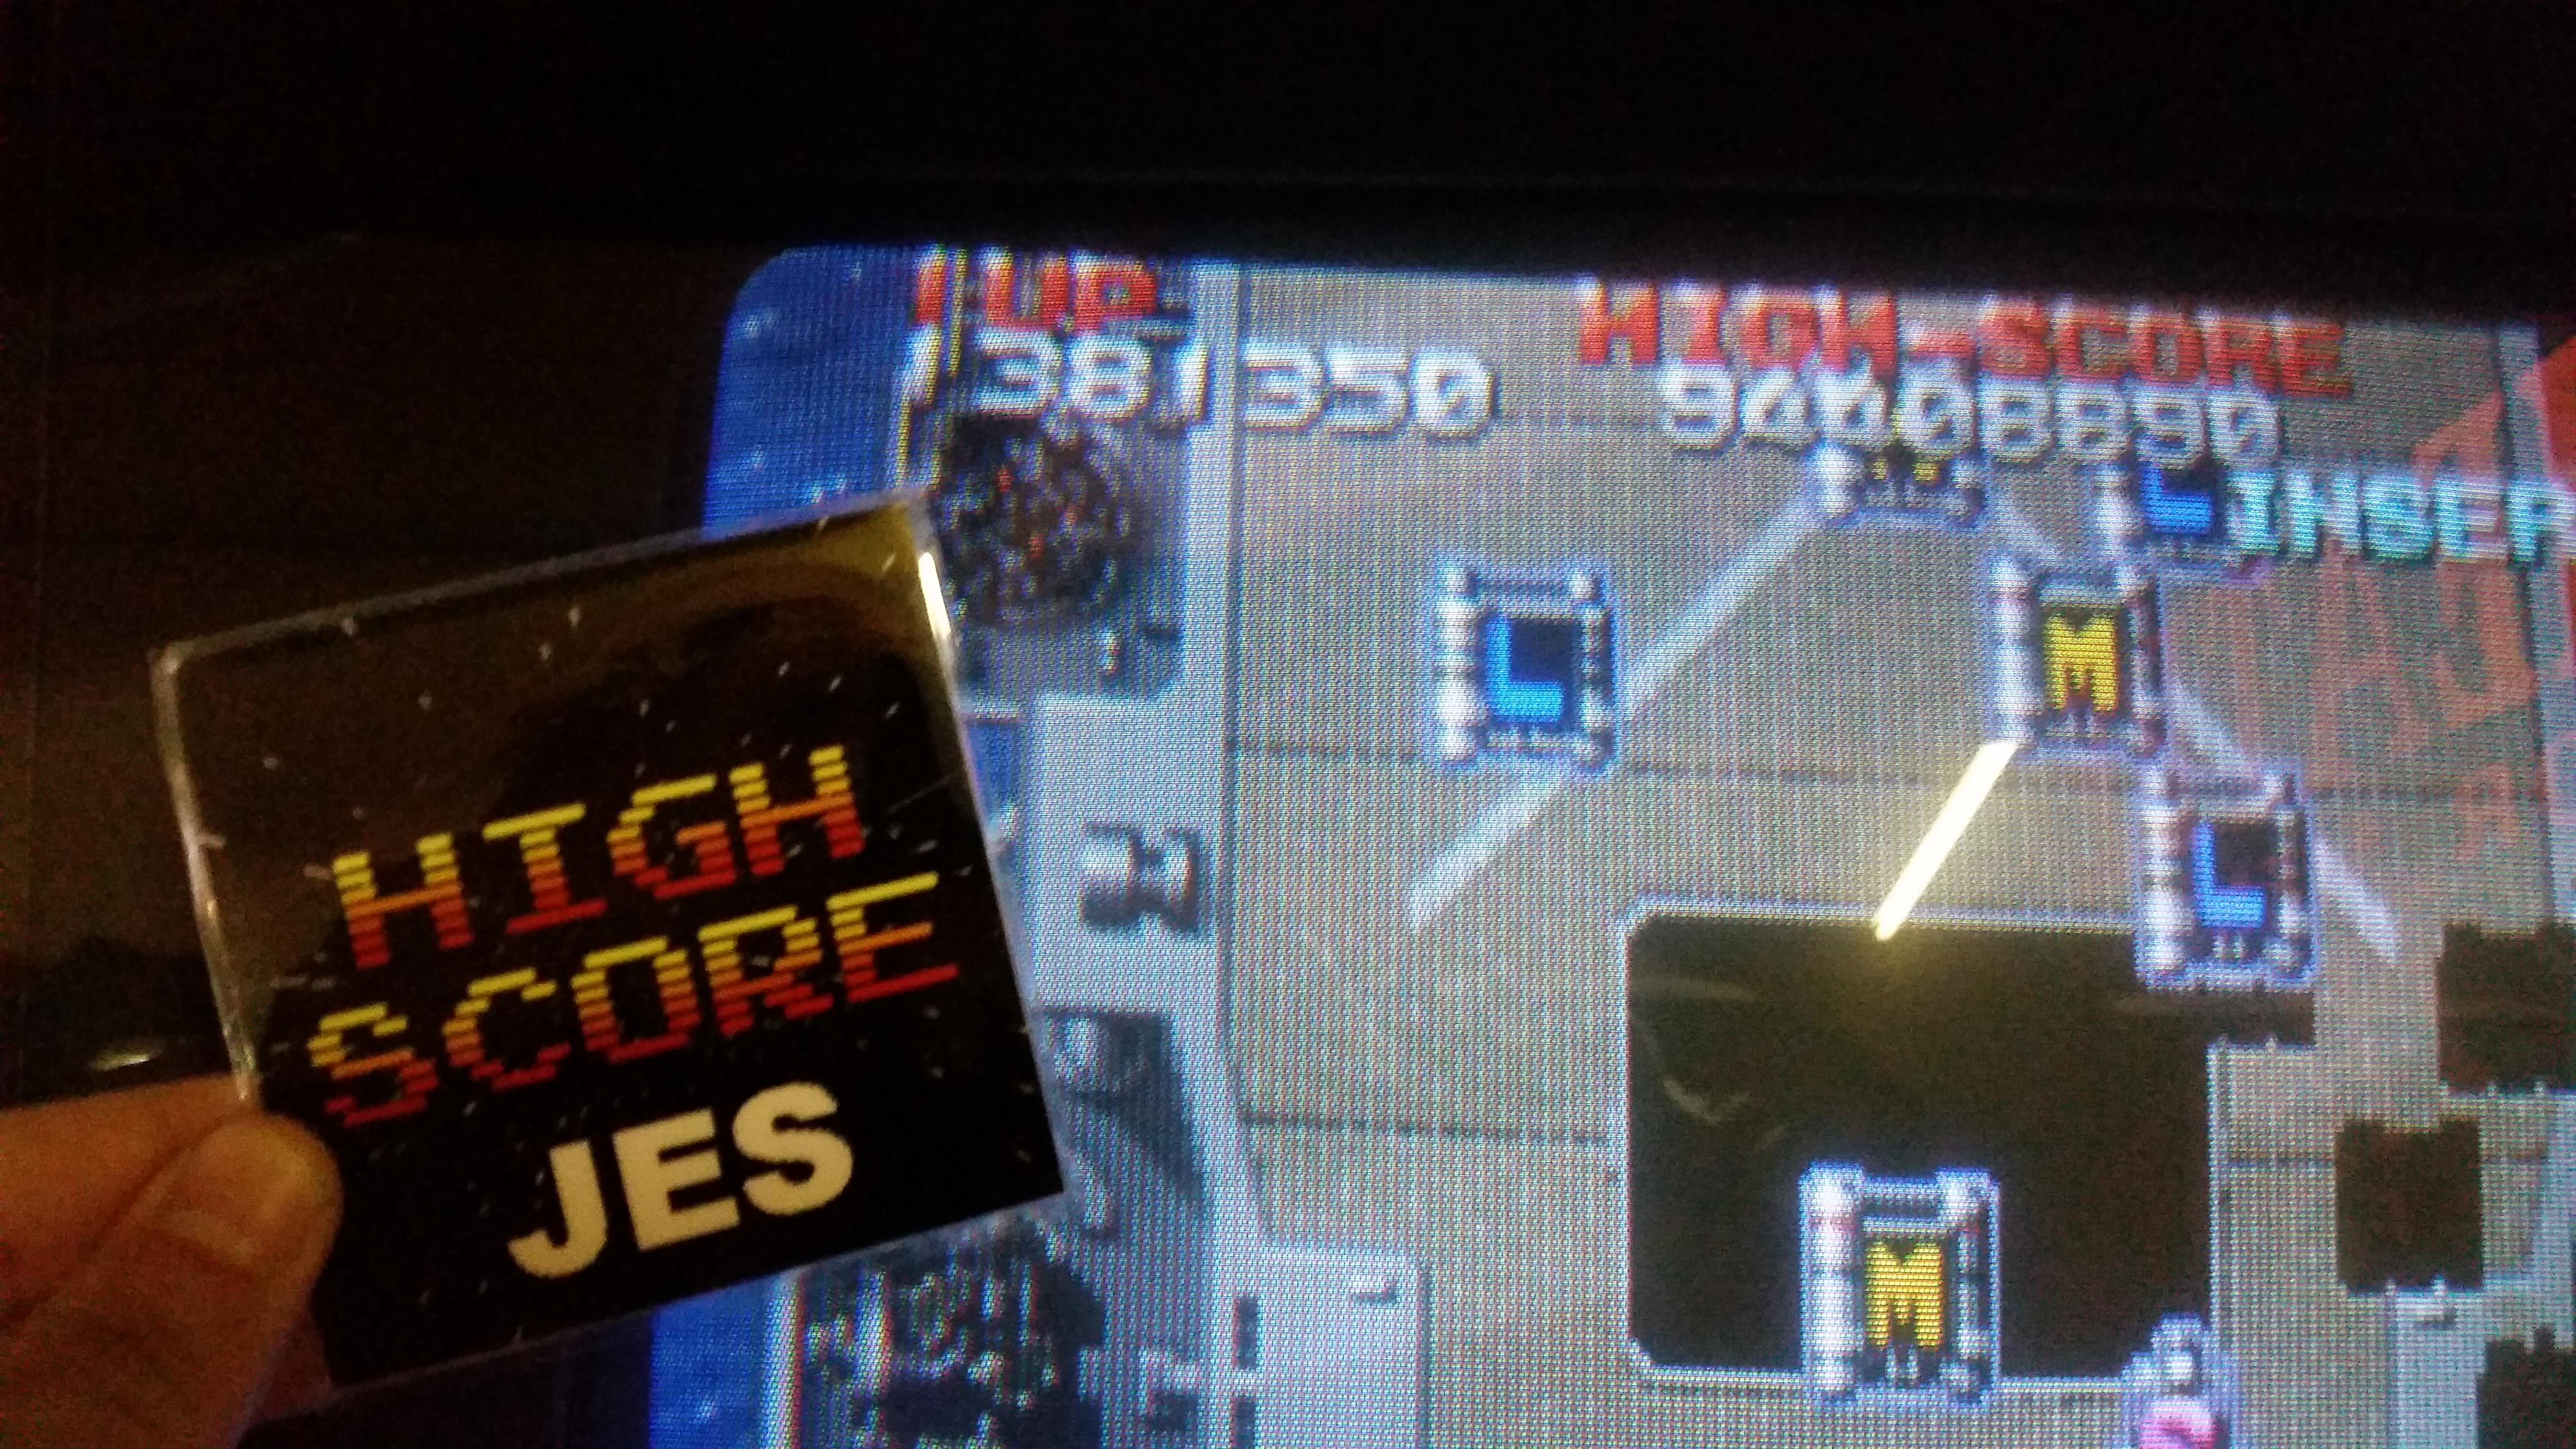 JES: Raiden Fighters (Arcade) 1,381,350 points on 2017-05-05 01:55:25